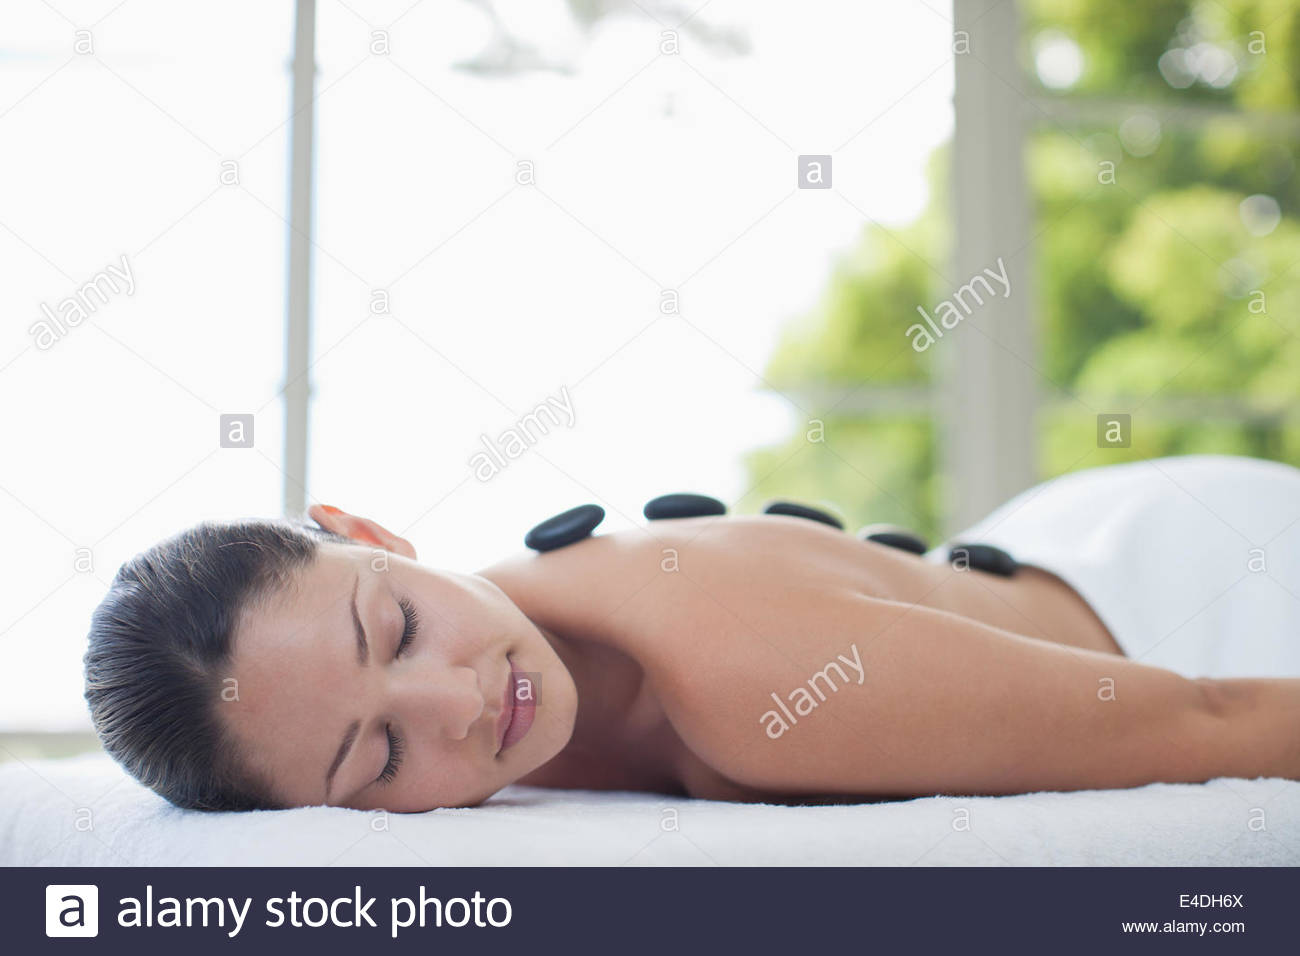 Woman enjoying thérapie avec pierres chaudes Photo Stock